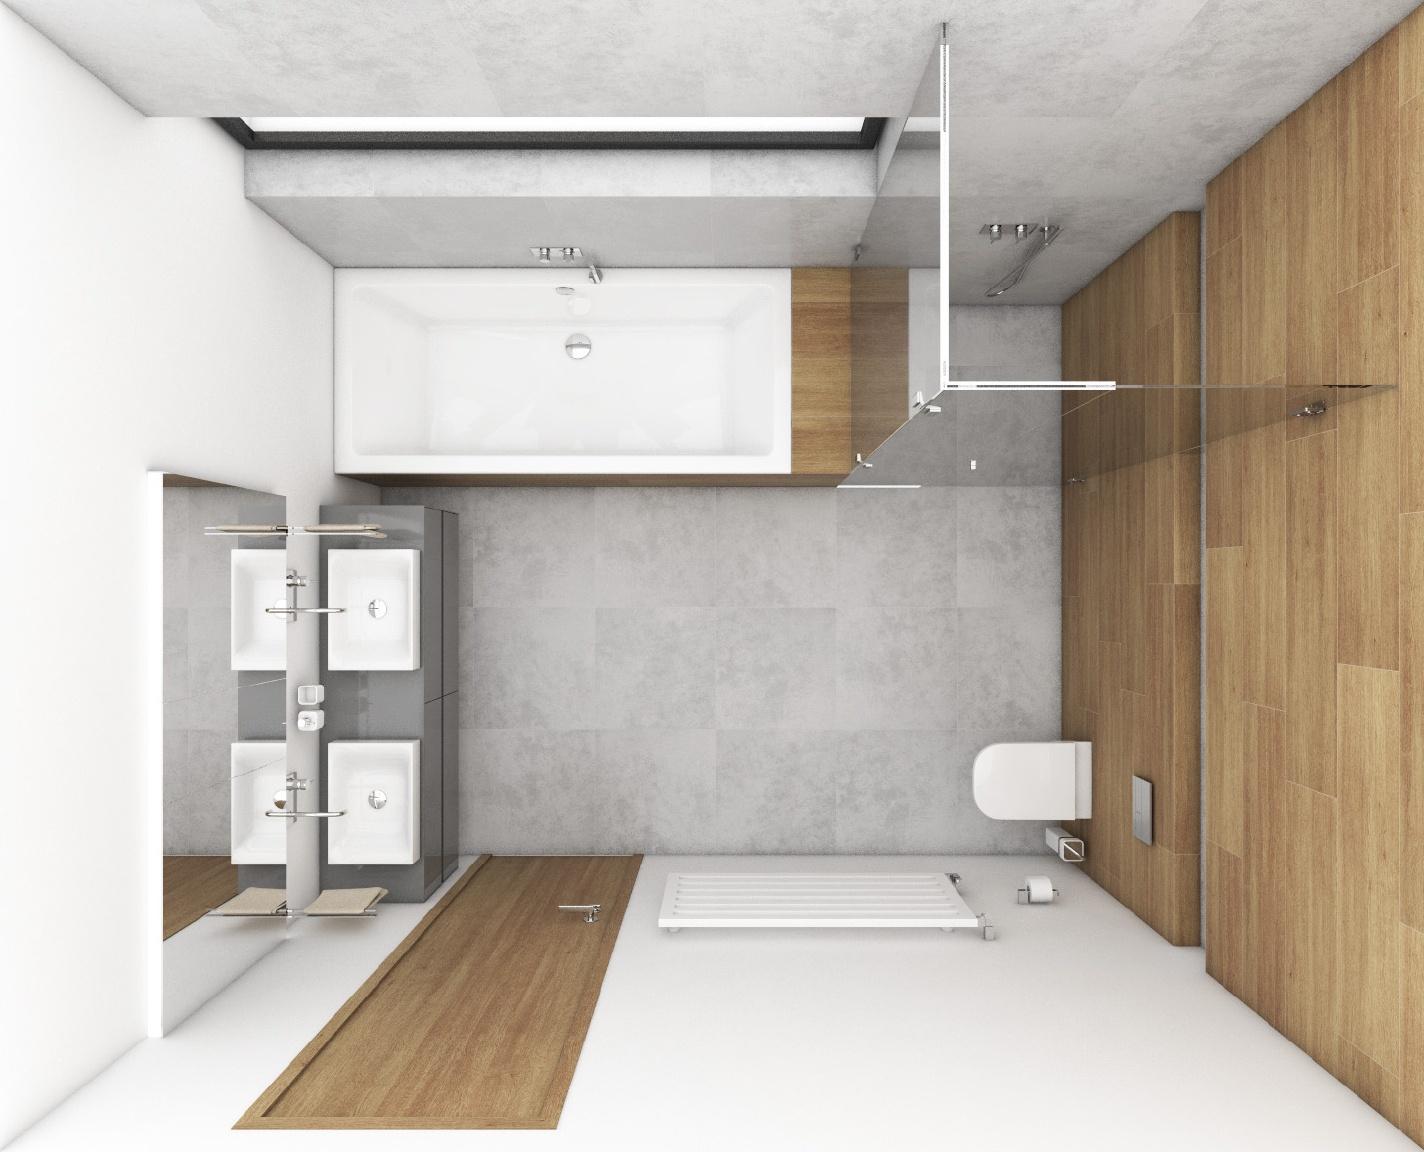 Modernes badezimmer gris perfecto design - Moderne badezimmer grundrisse ...